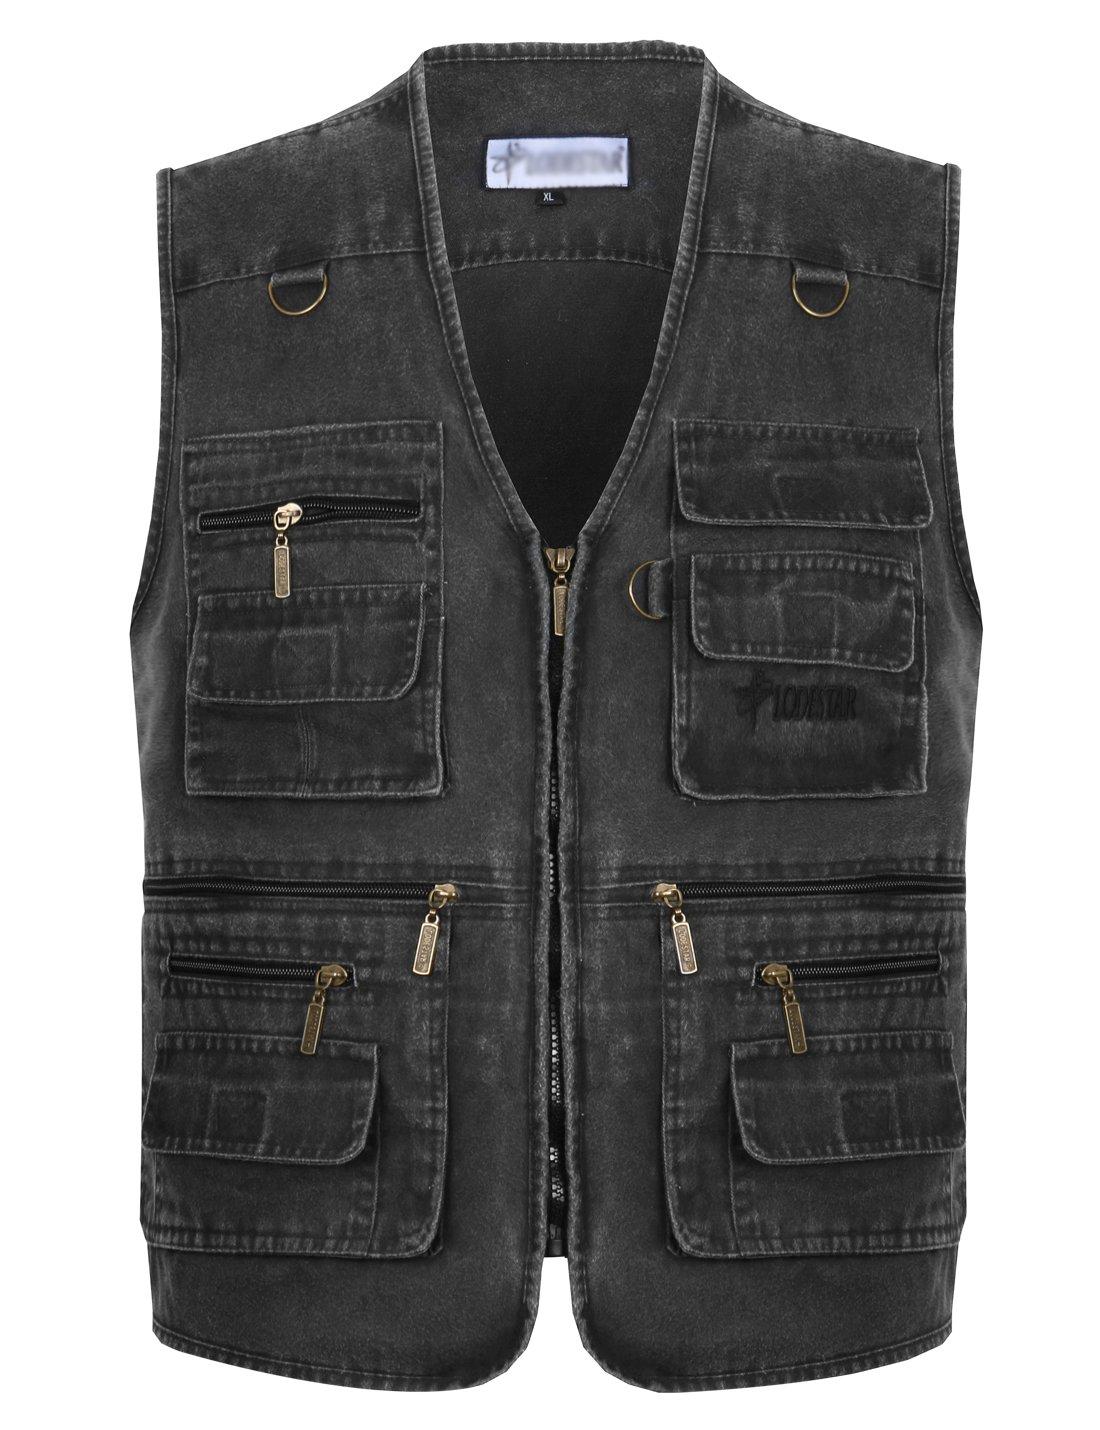 Gihuo Men's Casual Outdoor Leisure Lightweight Pockets Fishing Photo Journalist Denim Vest Plus Size (X-L, Grey)